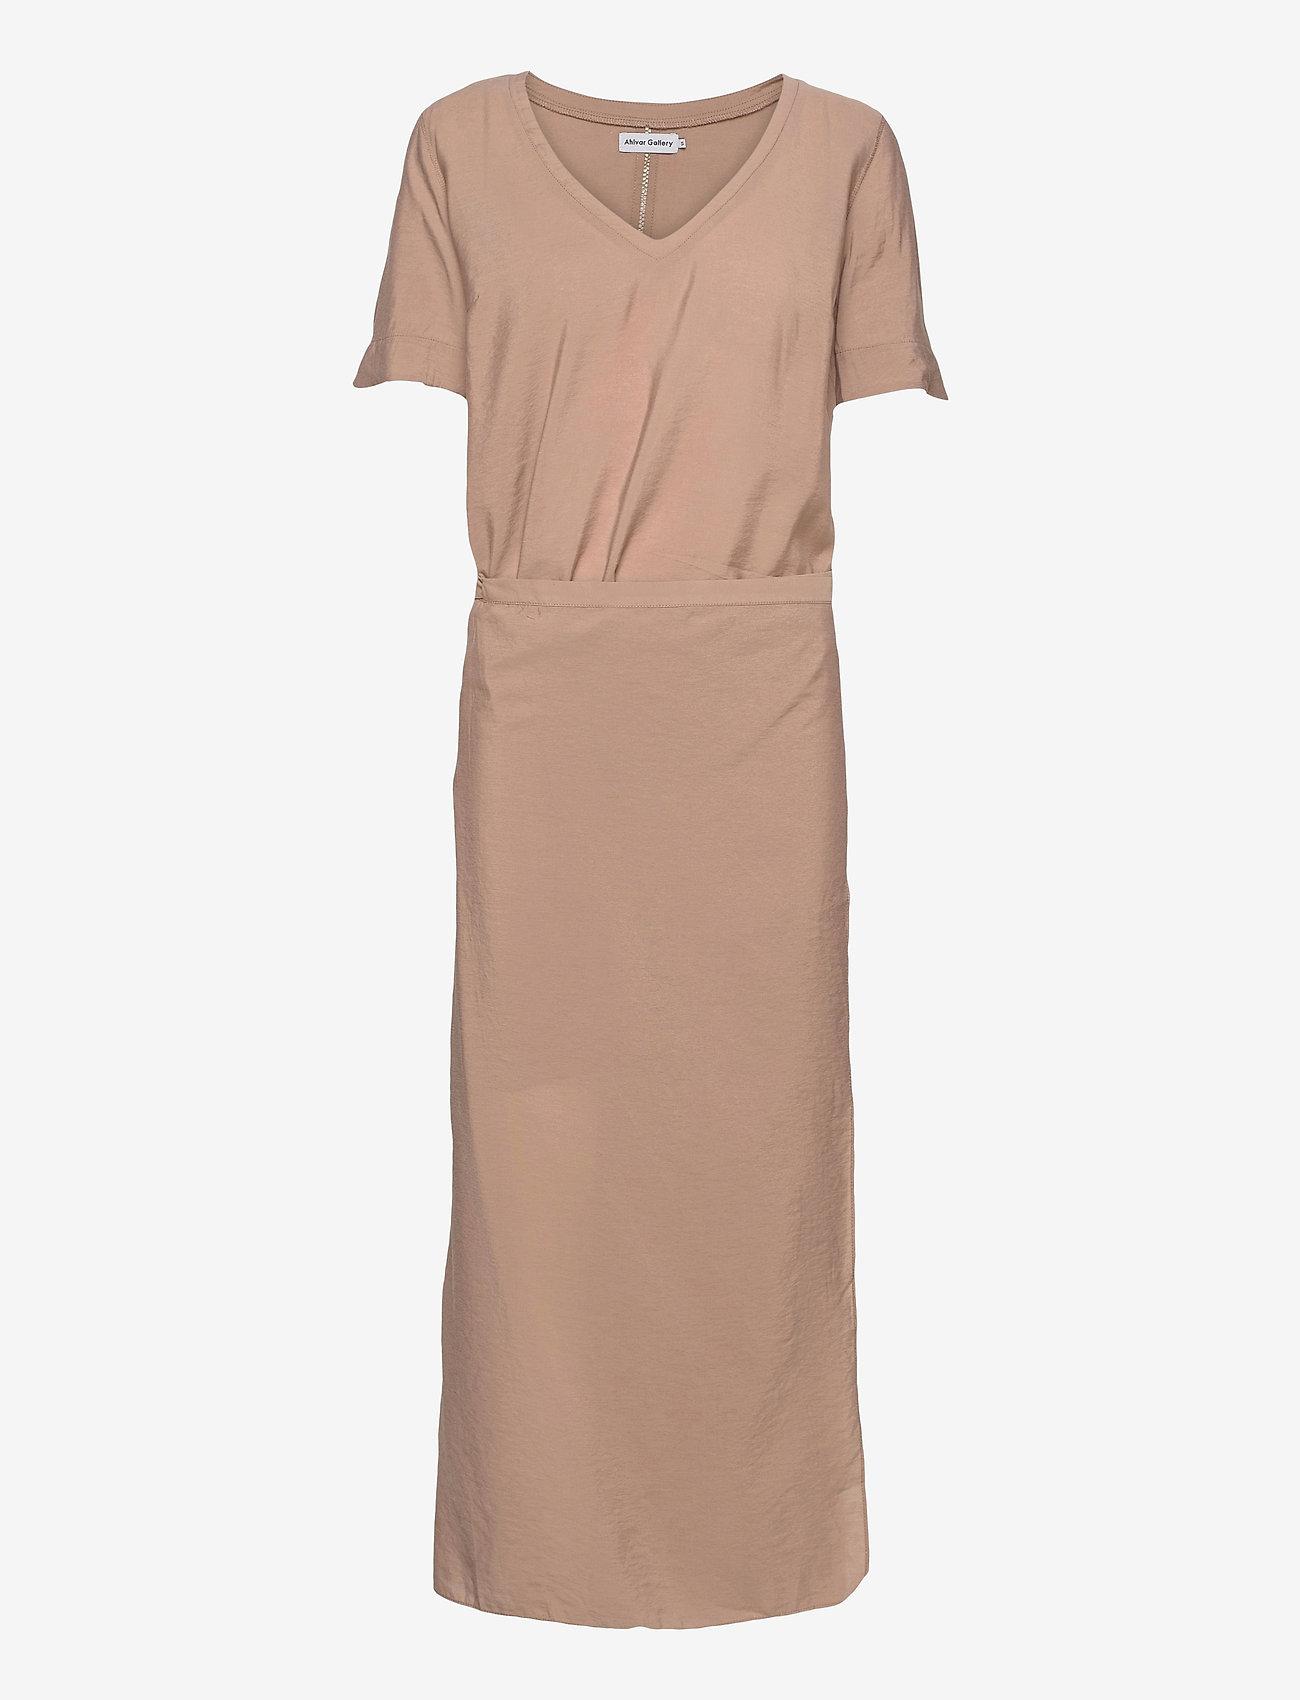 Ahlvar Gallery - Tamila dress - maxi dresses - sand - 1